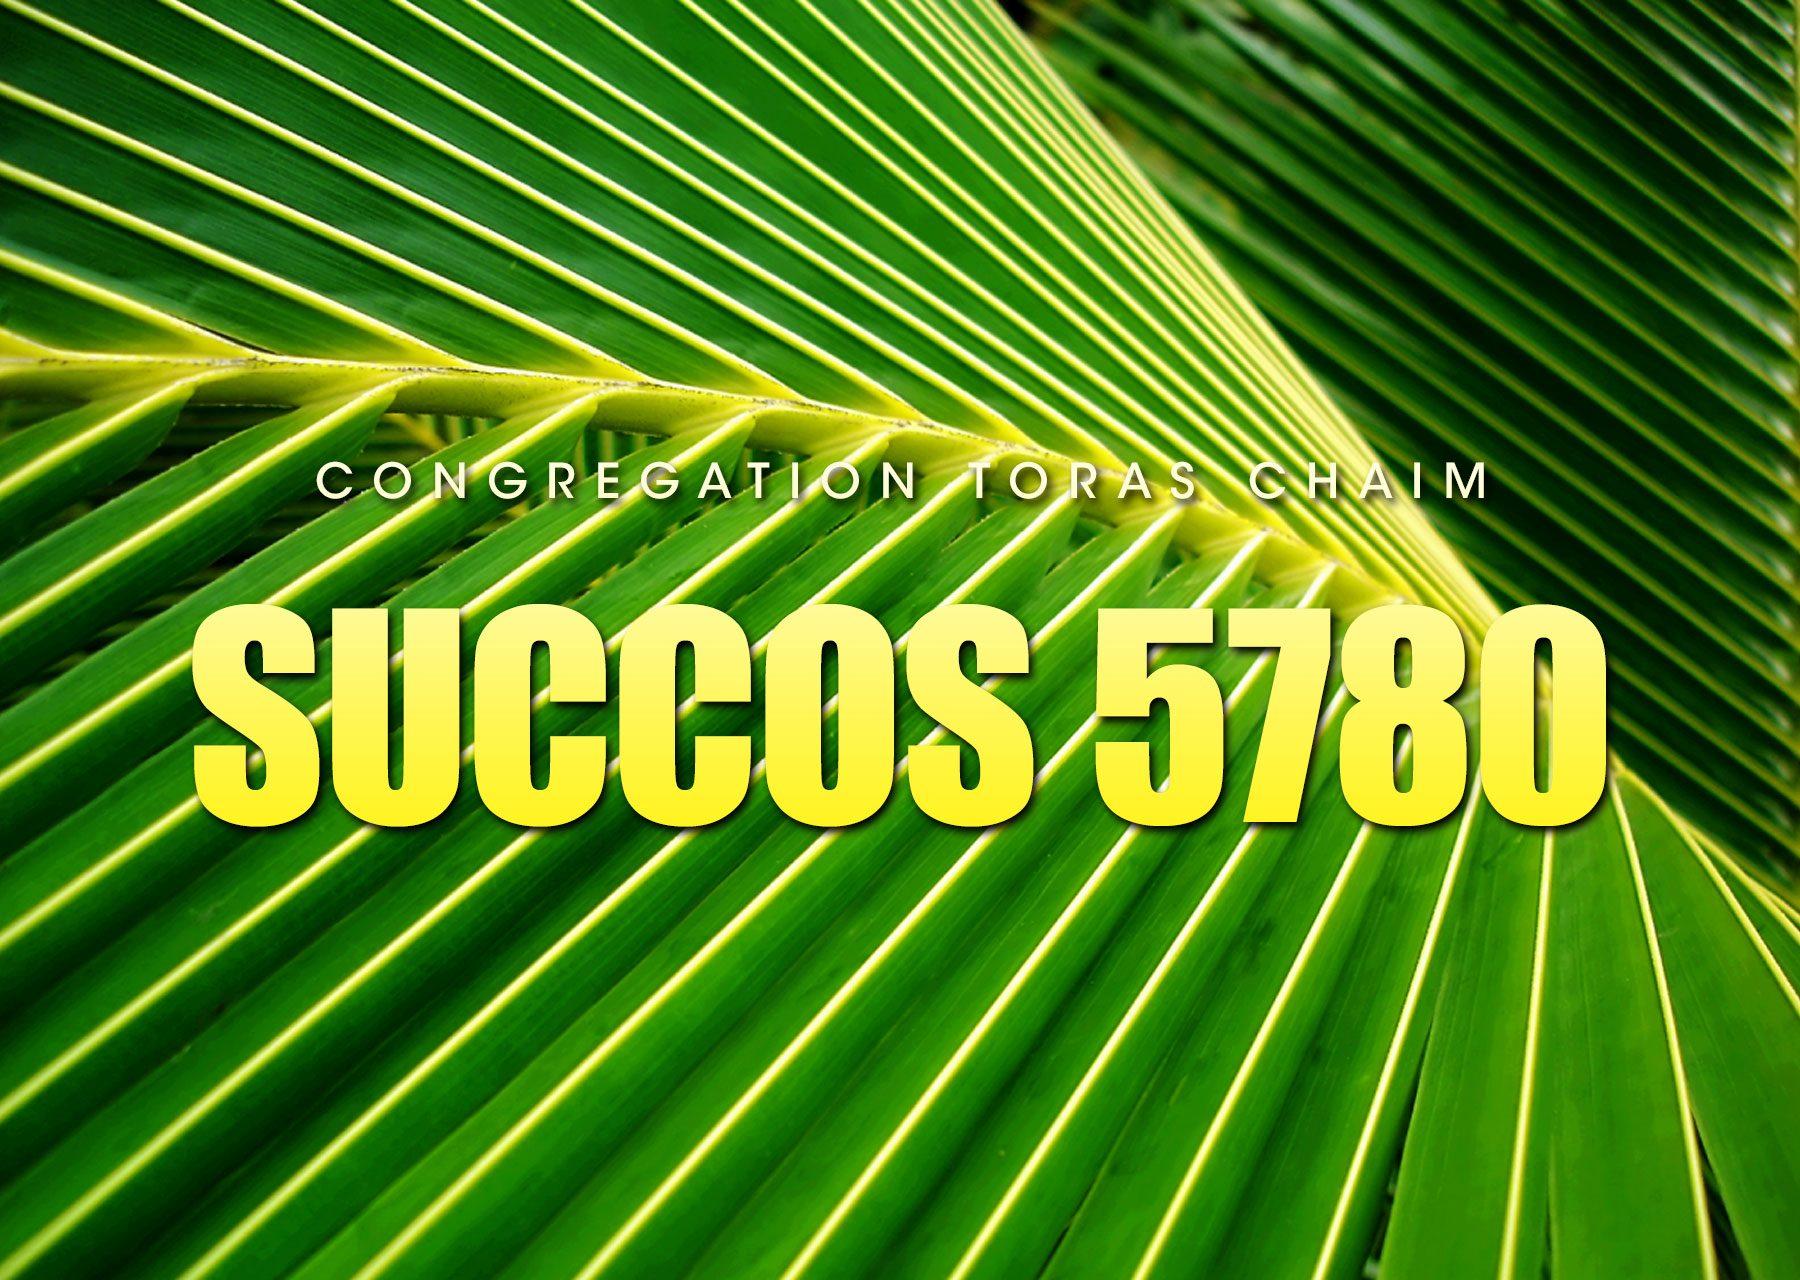 Succos Schedule 5780